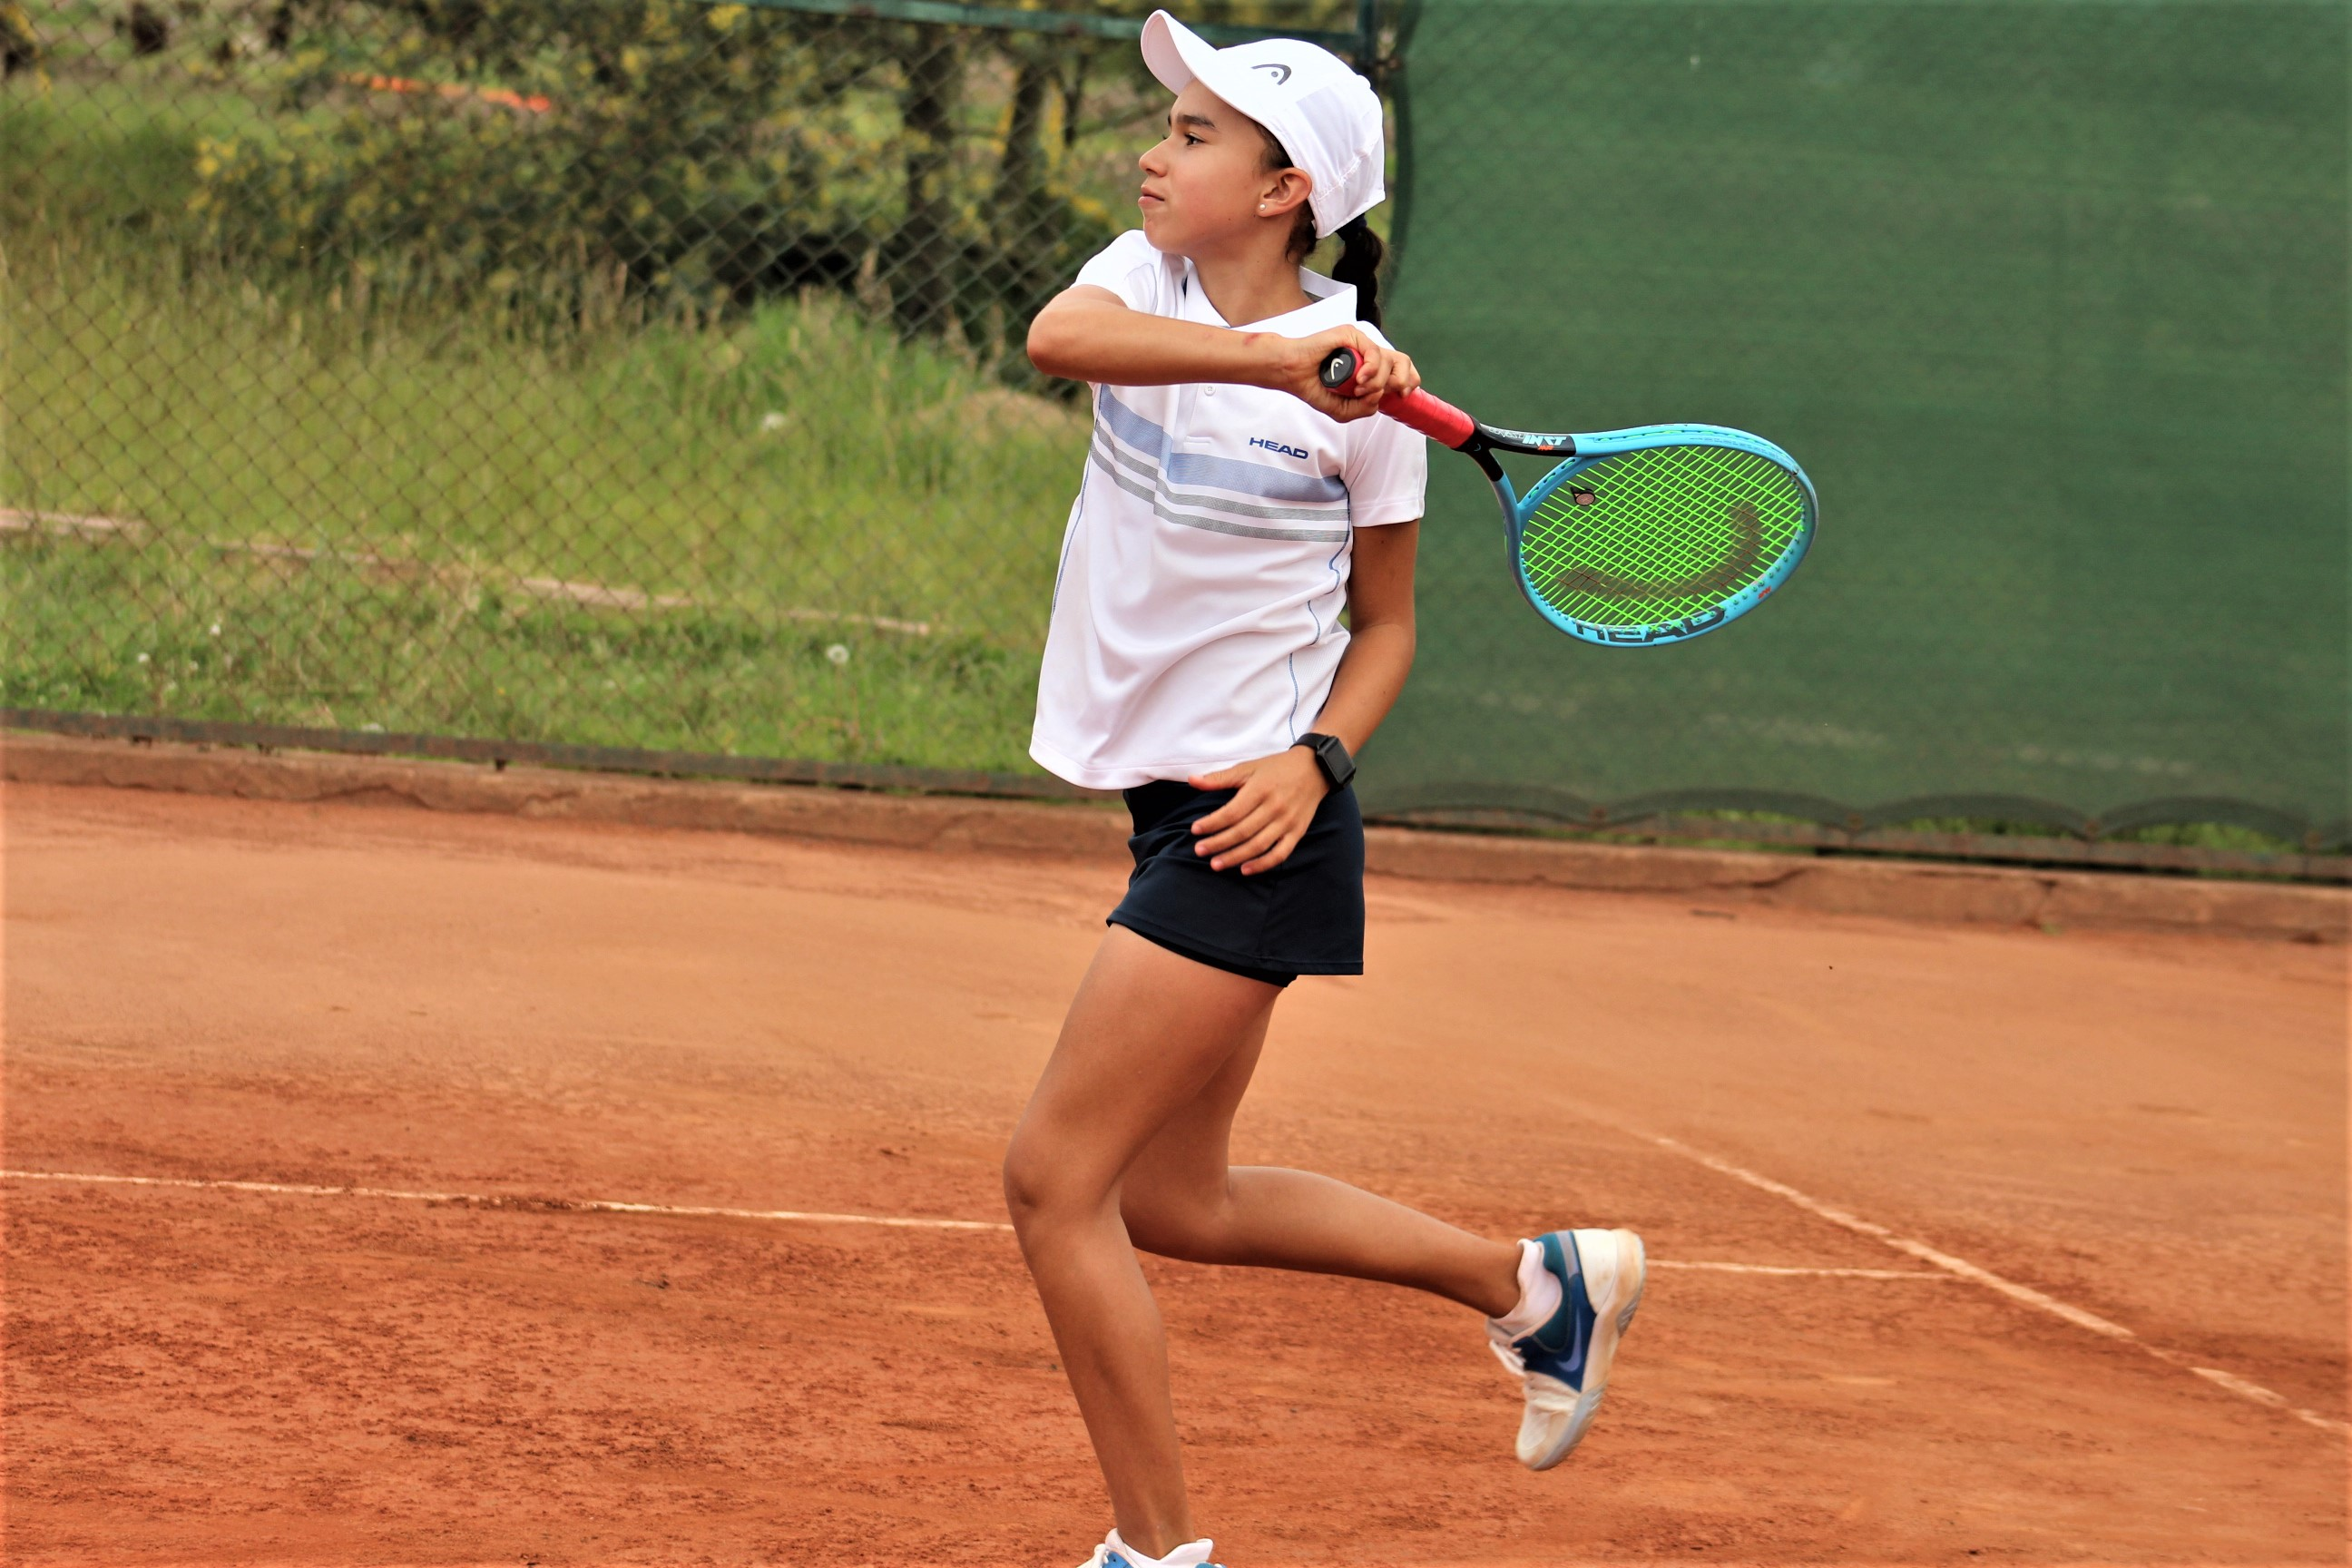 maria jose sanchez tenista colombiano.JPG (771 KB)